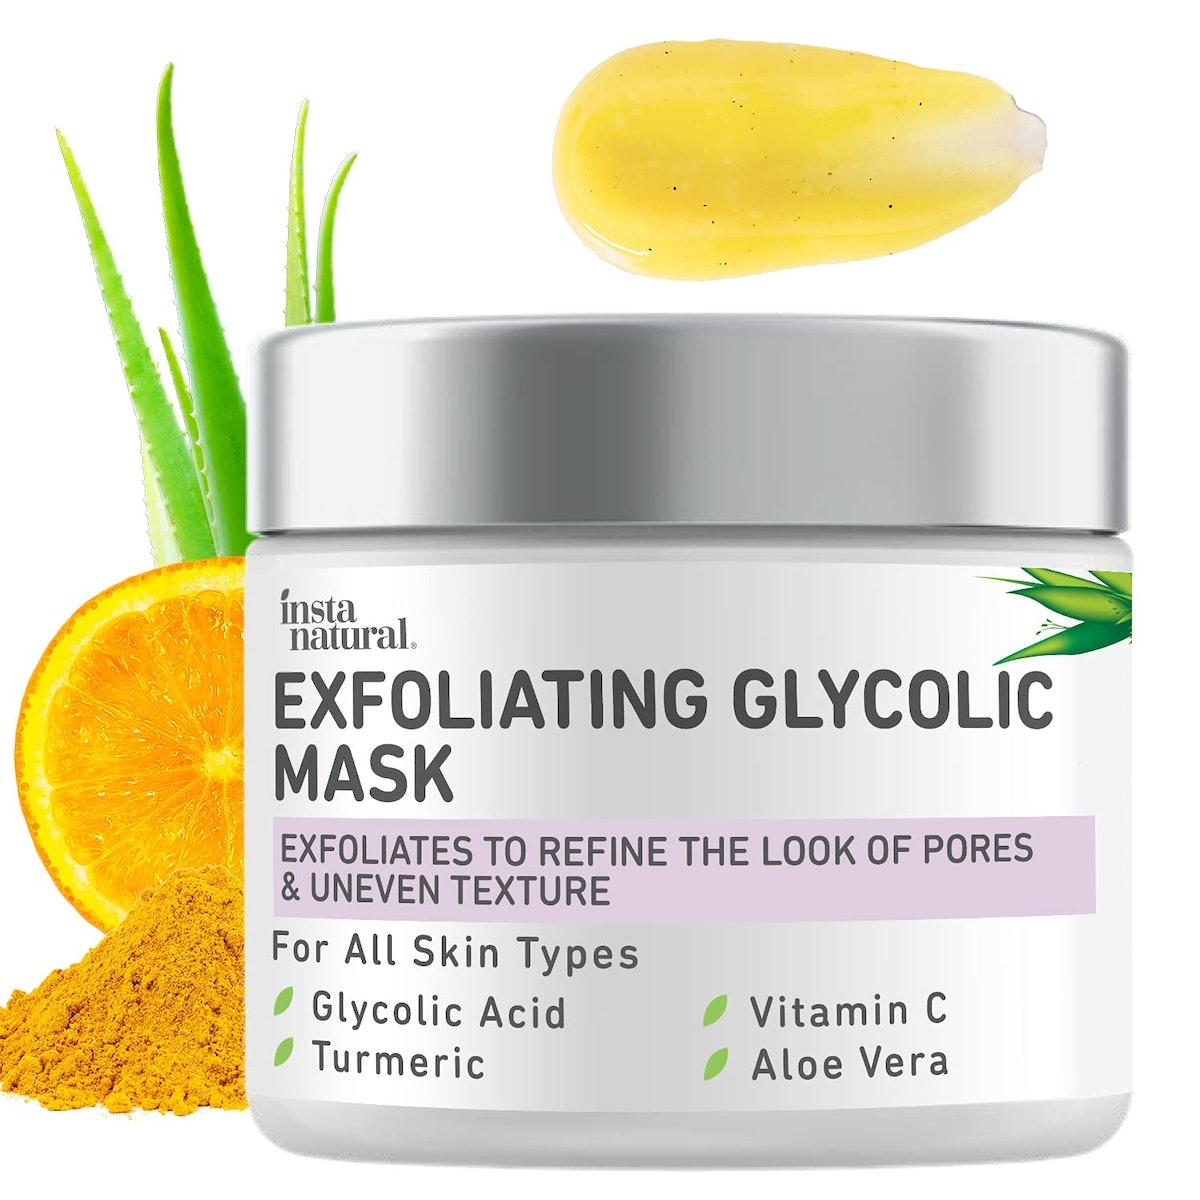 InstaNatural Exfoliating Glycolic Mask